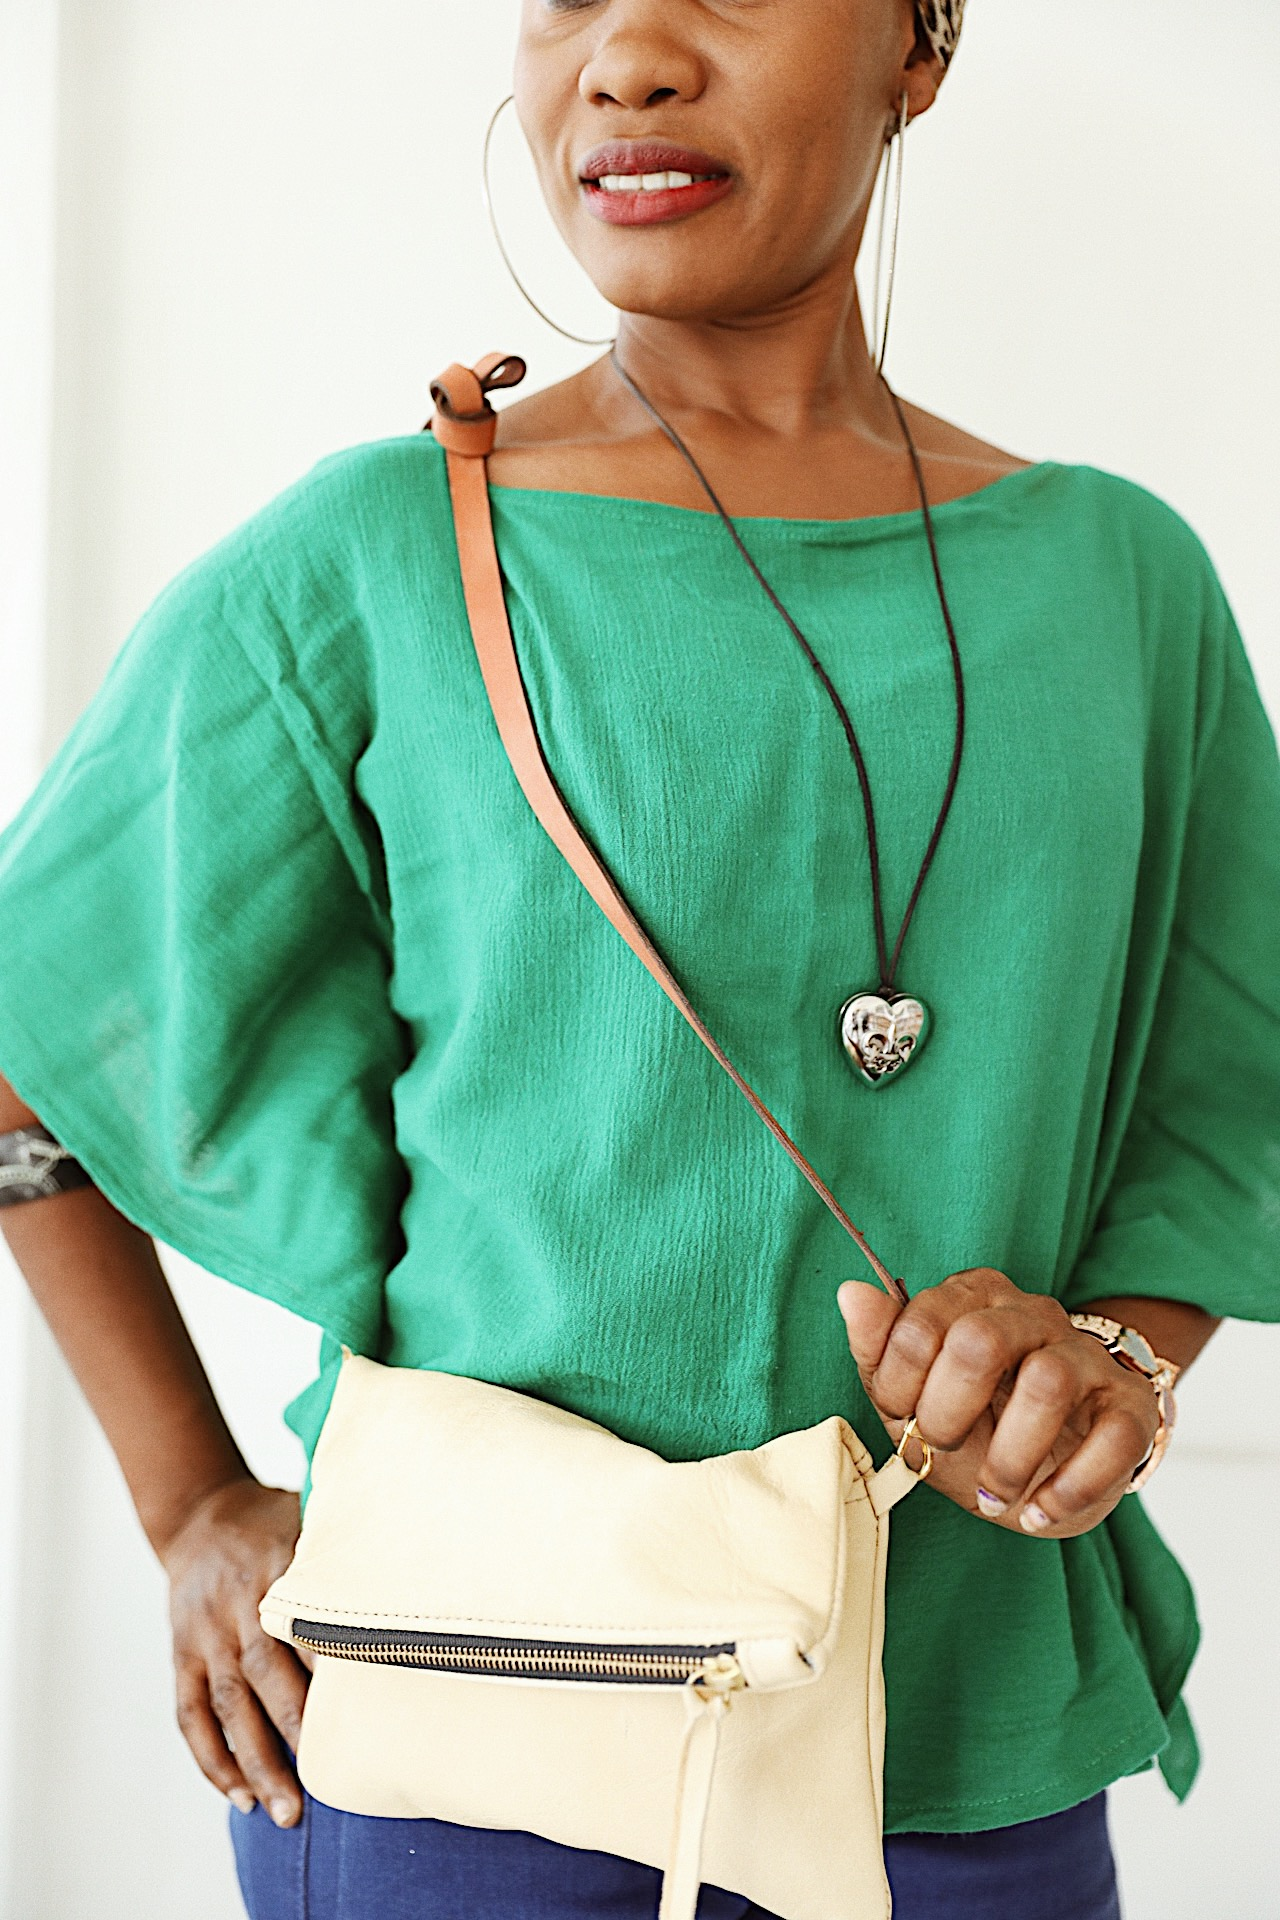 Darline fashion revolution with essentials crossbody.jpg